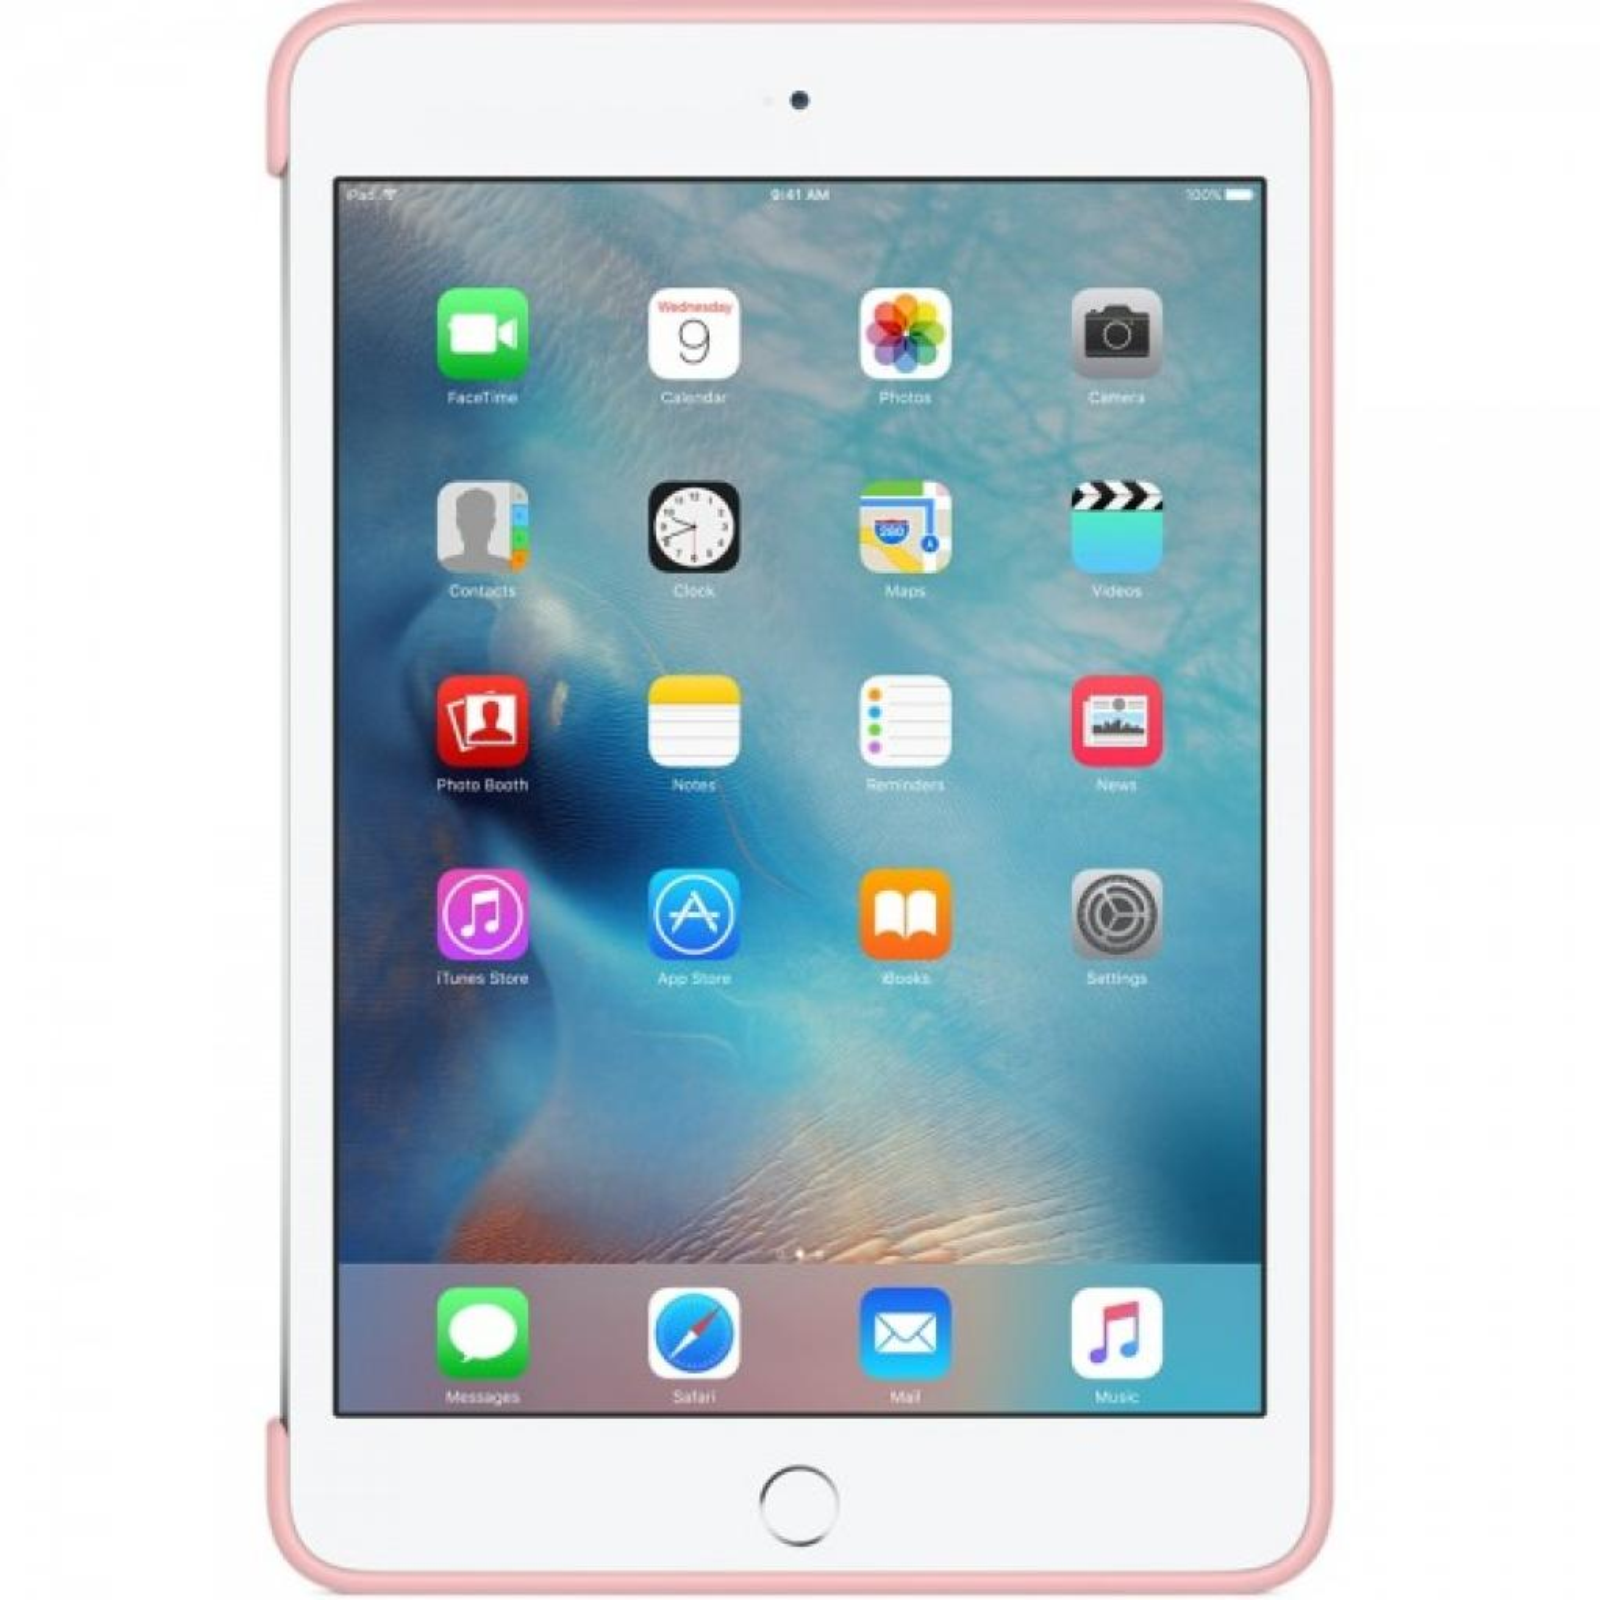 Чехол для планшета Apple iPad mini 4 Pink (MLD52ZM/A) изображение 4